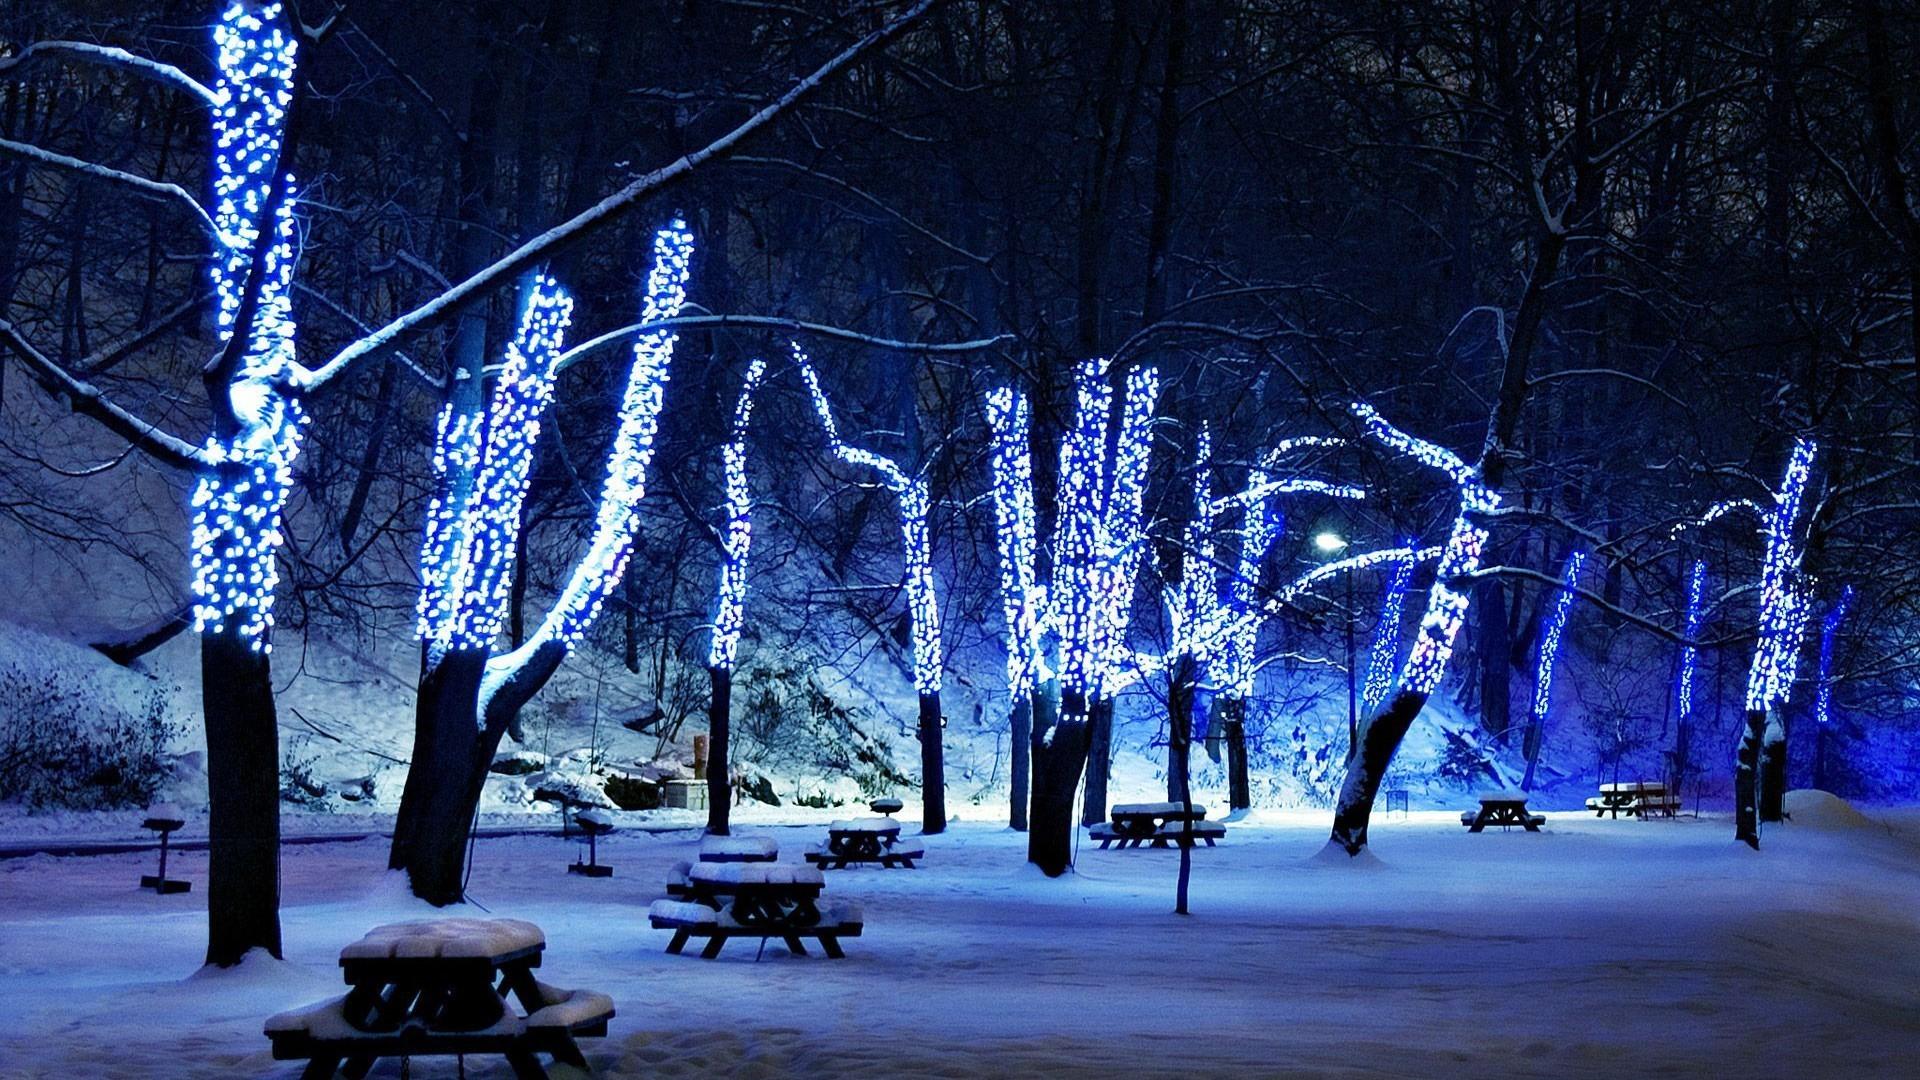 Christmas-Lights-Wallpapers-HD-Wallpaper 2013